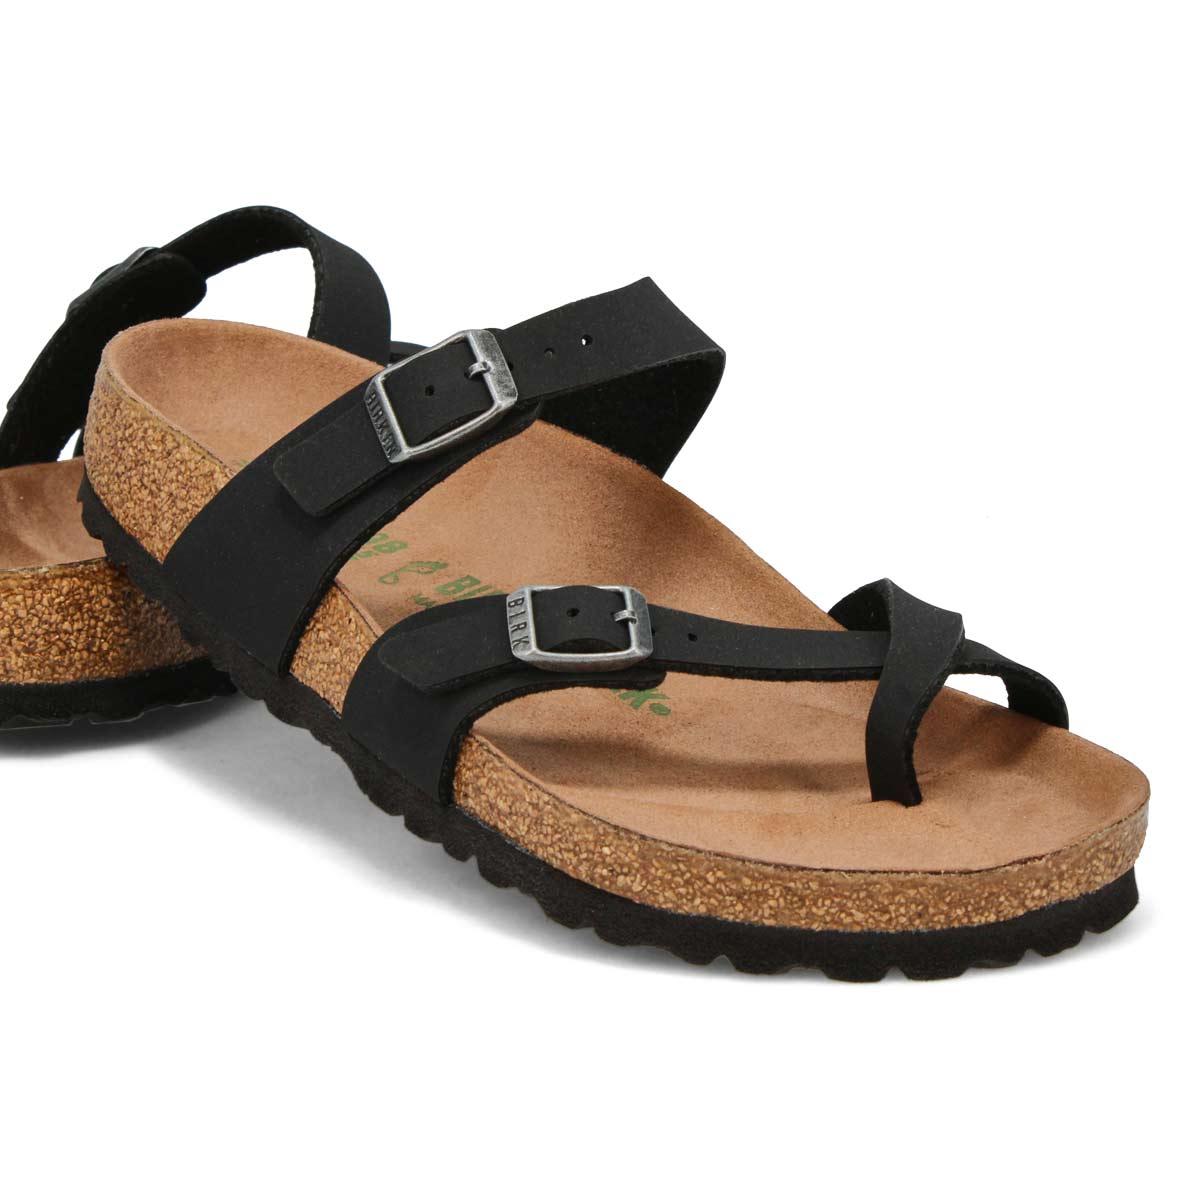 Sandale passe-orteil MAYARI VEGAN BF noire, femmes